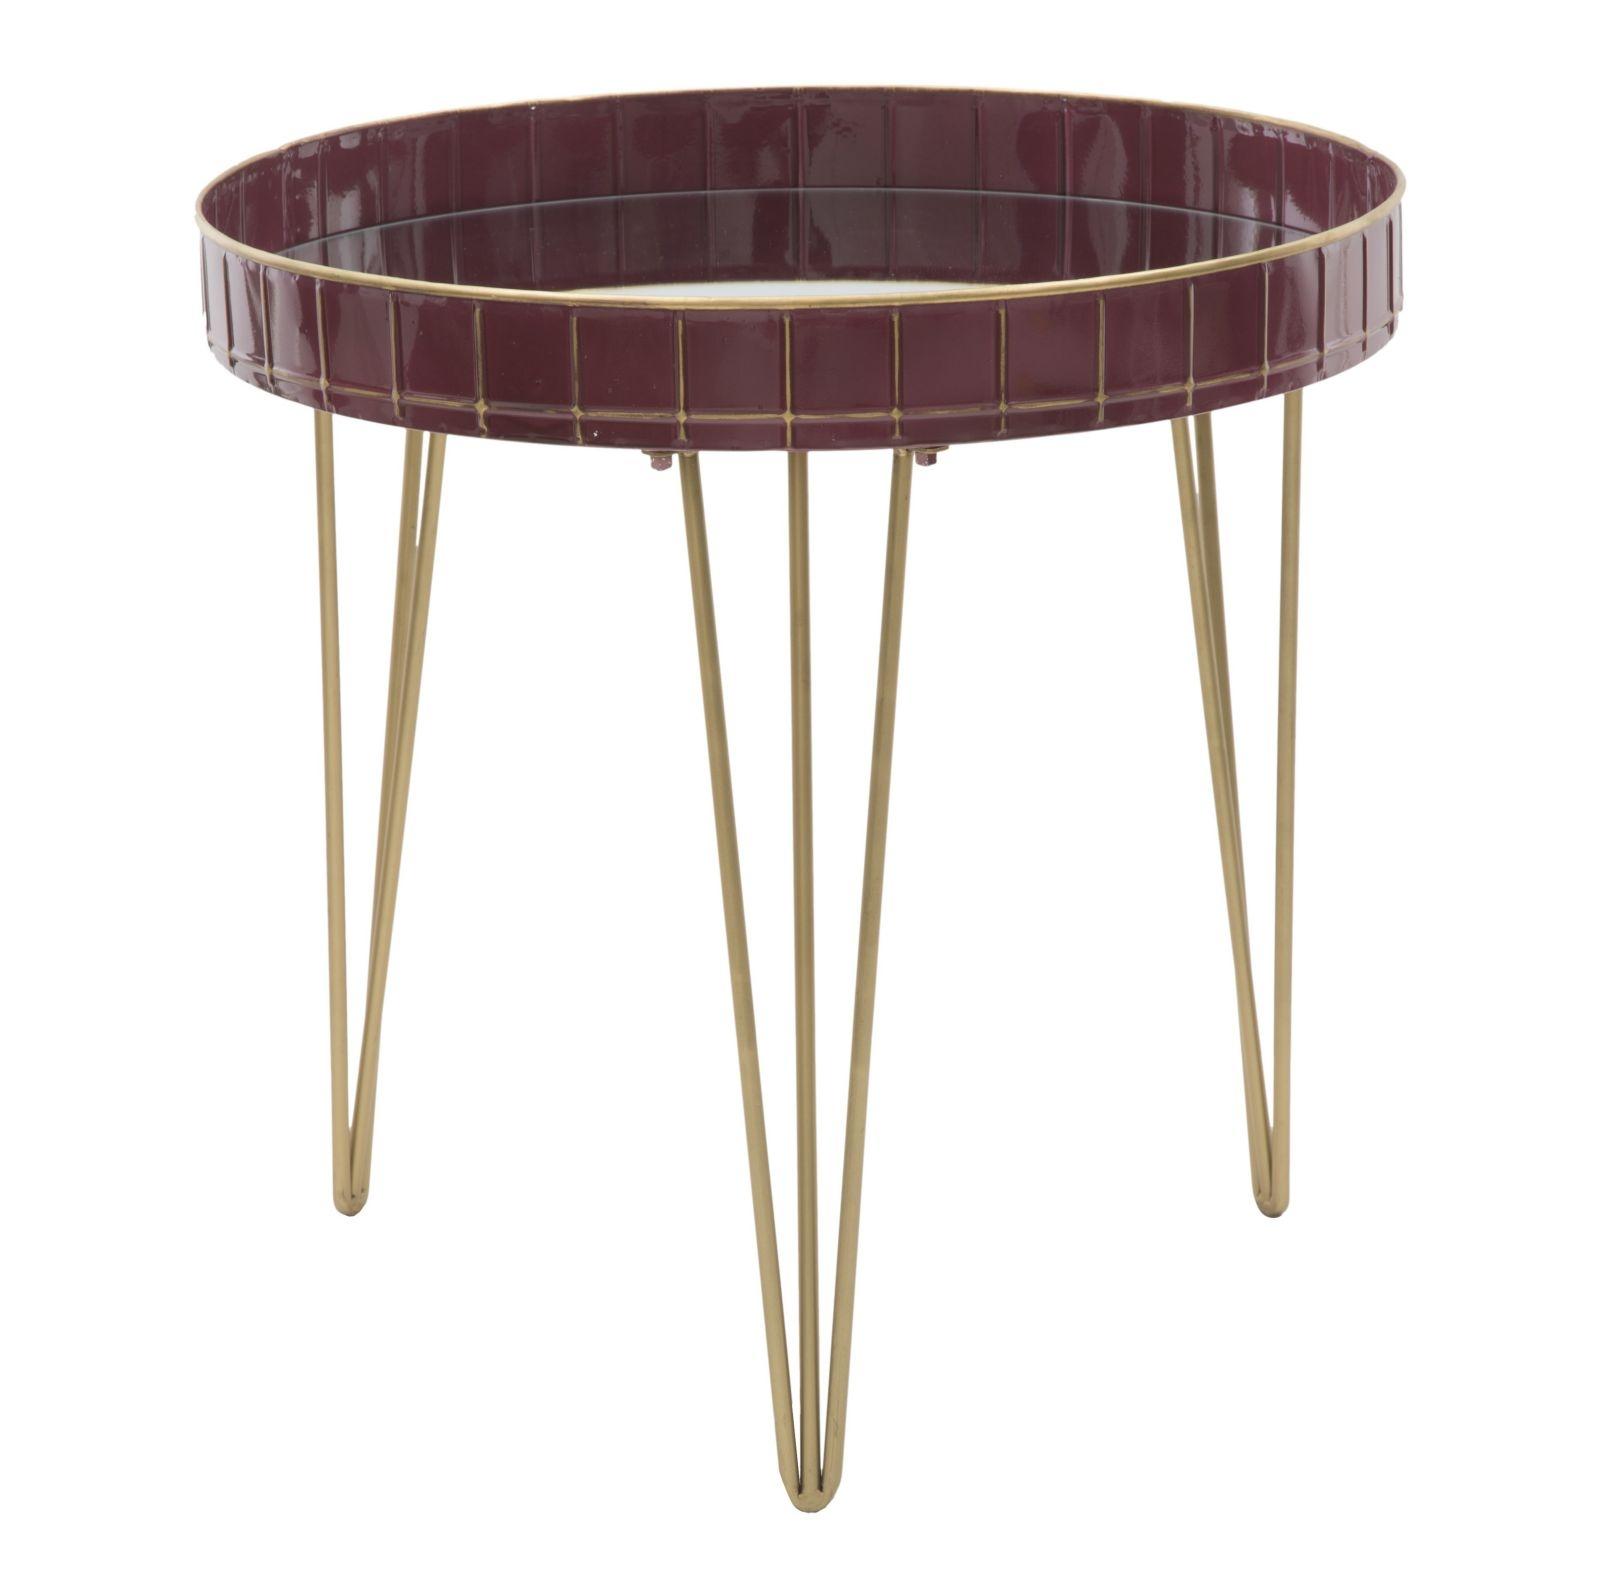 Masa de cafea din metal si sticla Glam Bordeaux O 60xH60 cm